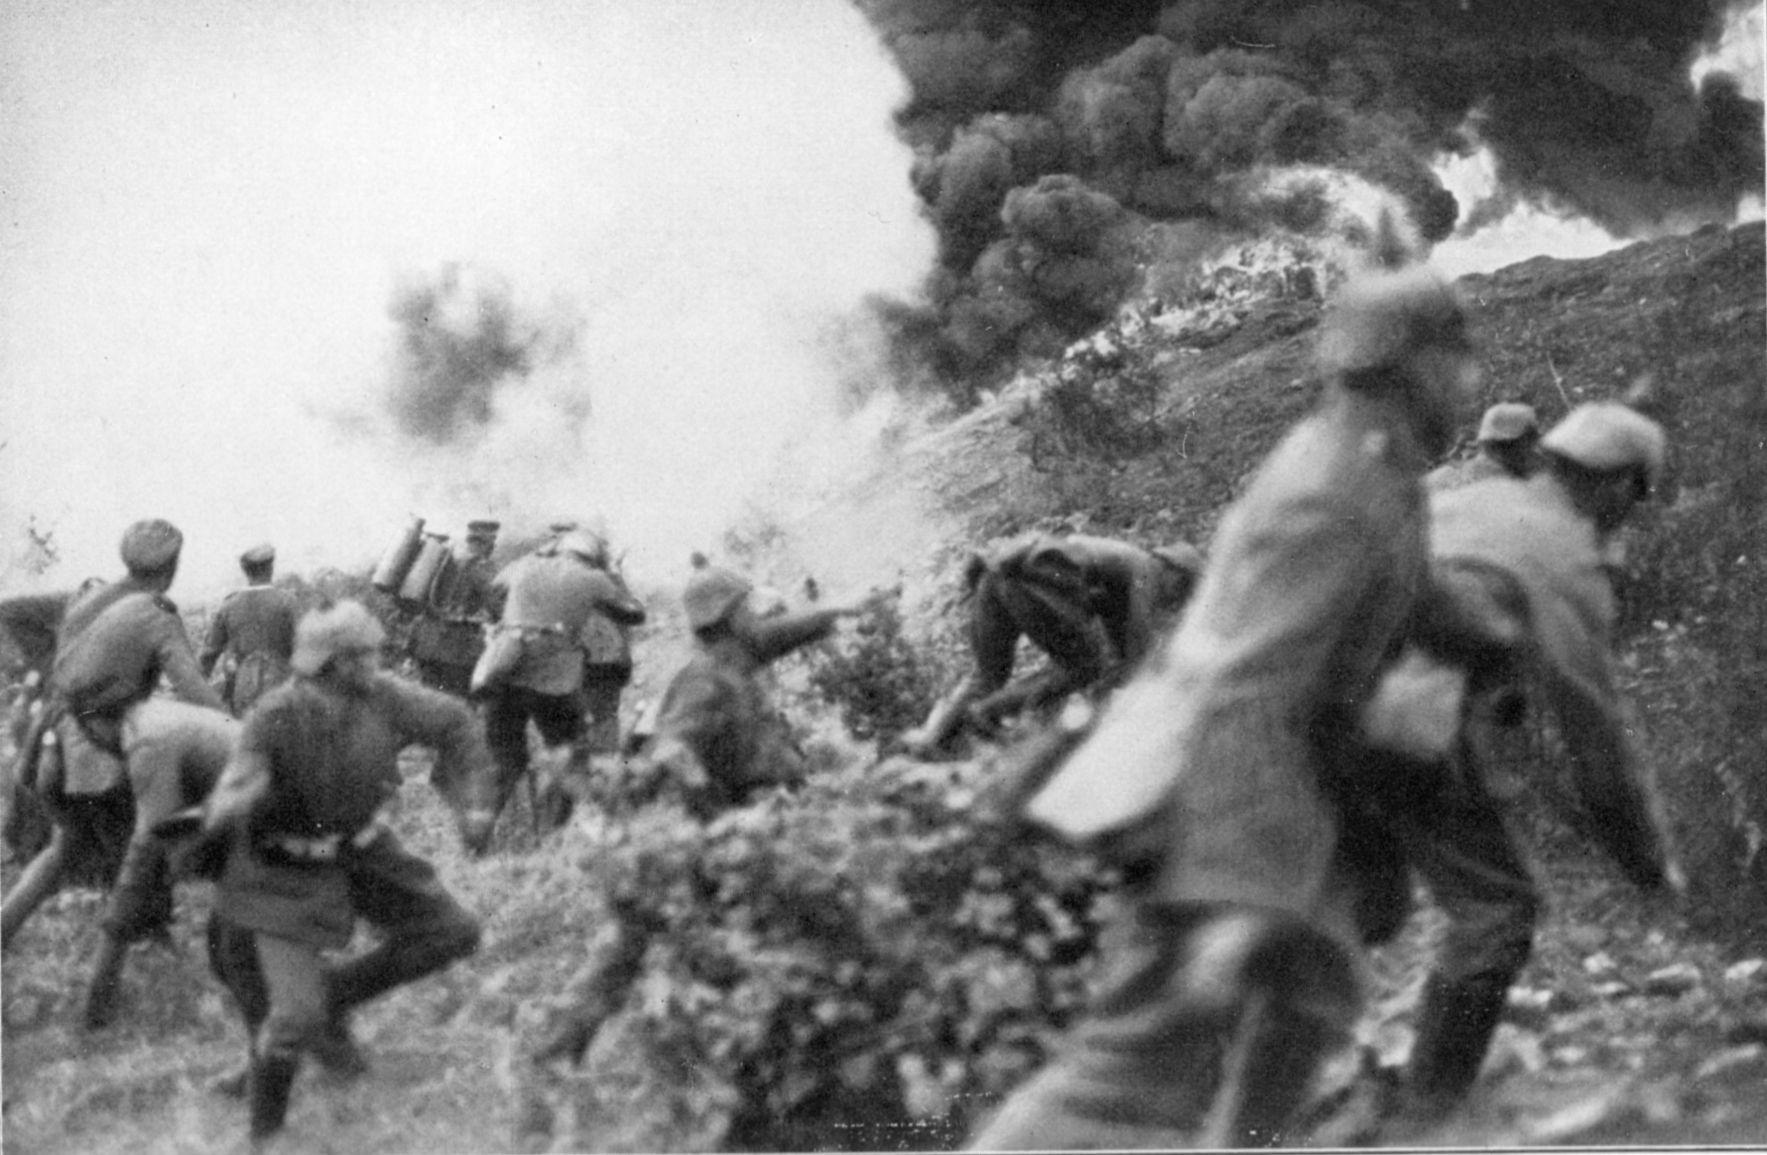 German soldiers attacking at Verdun.